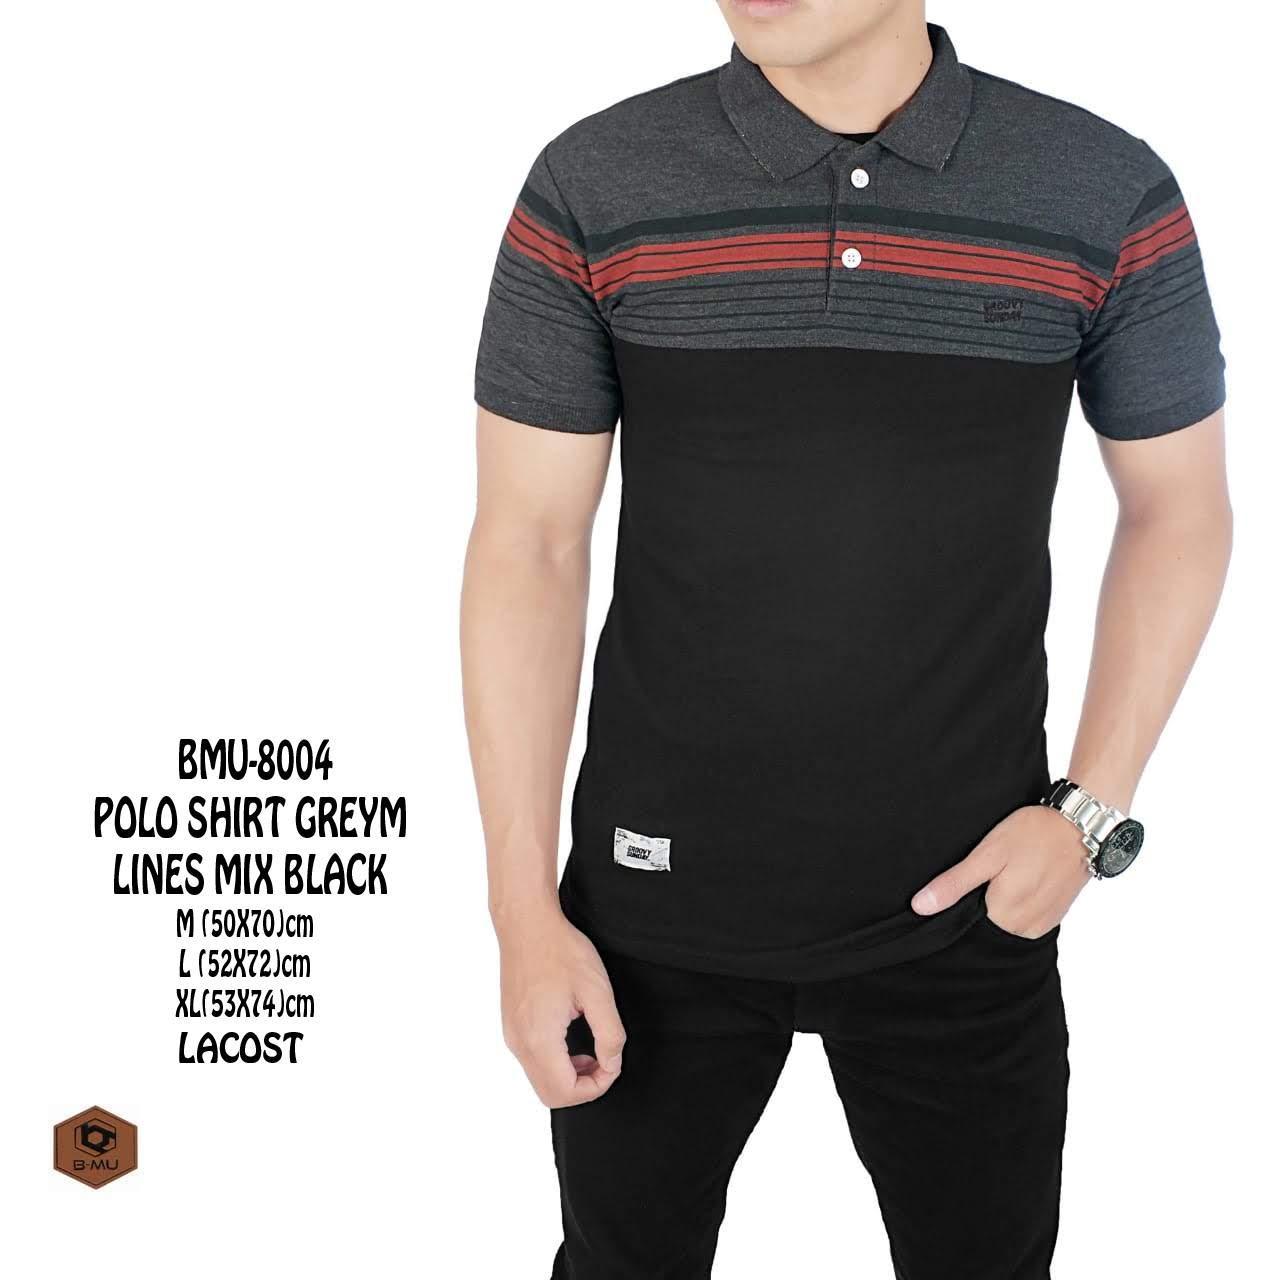 Buy Sell Cheapest Exclusive Kaos Convers Best Quality Product Haji Umrah Pria Lengan Pendek Bajuku Murah Polo Warna Hitam Kombinasi Seller Termurah Poloshirt